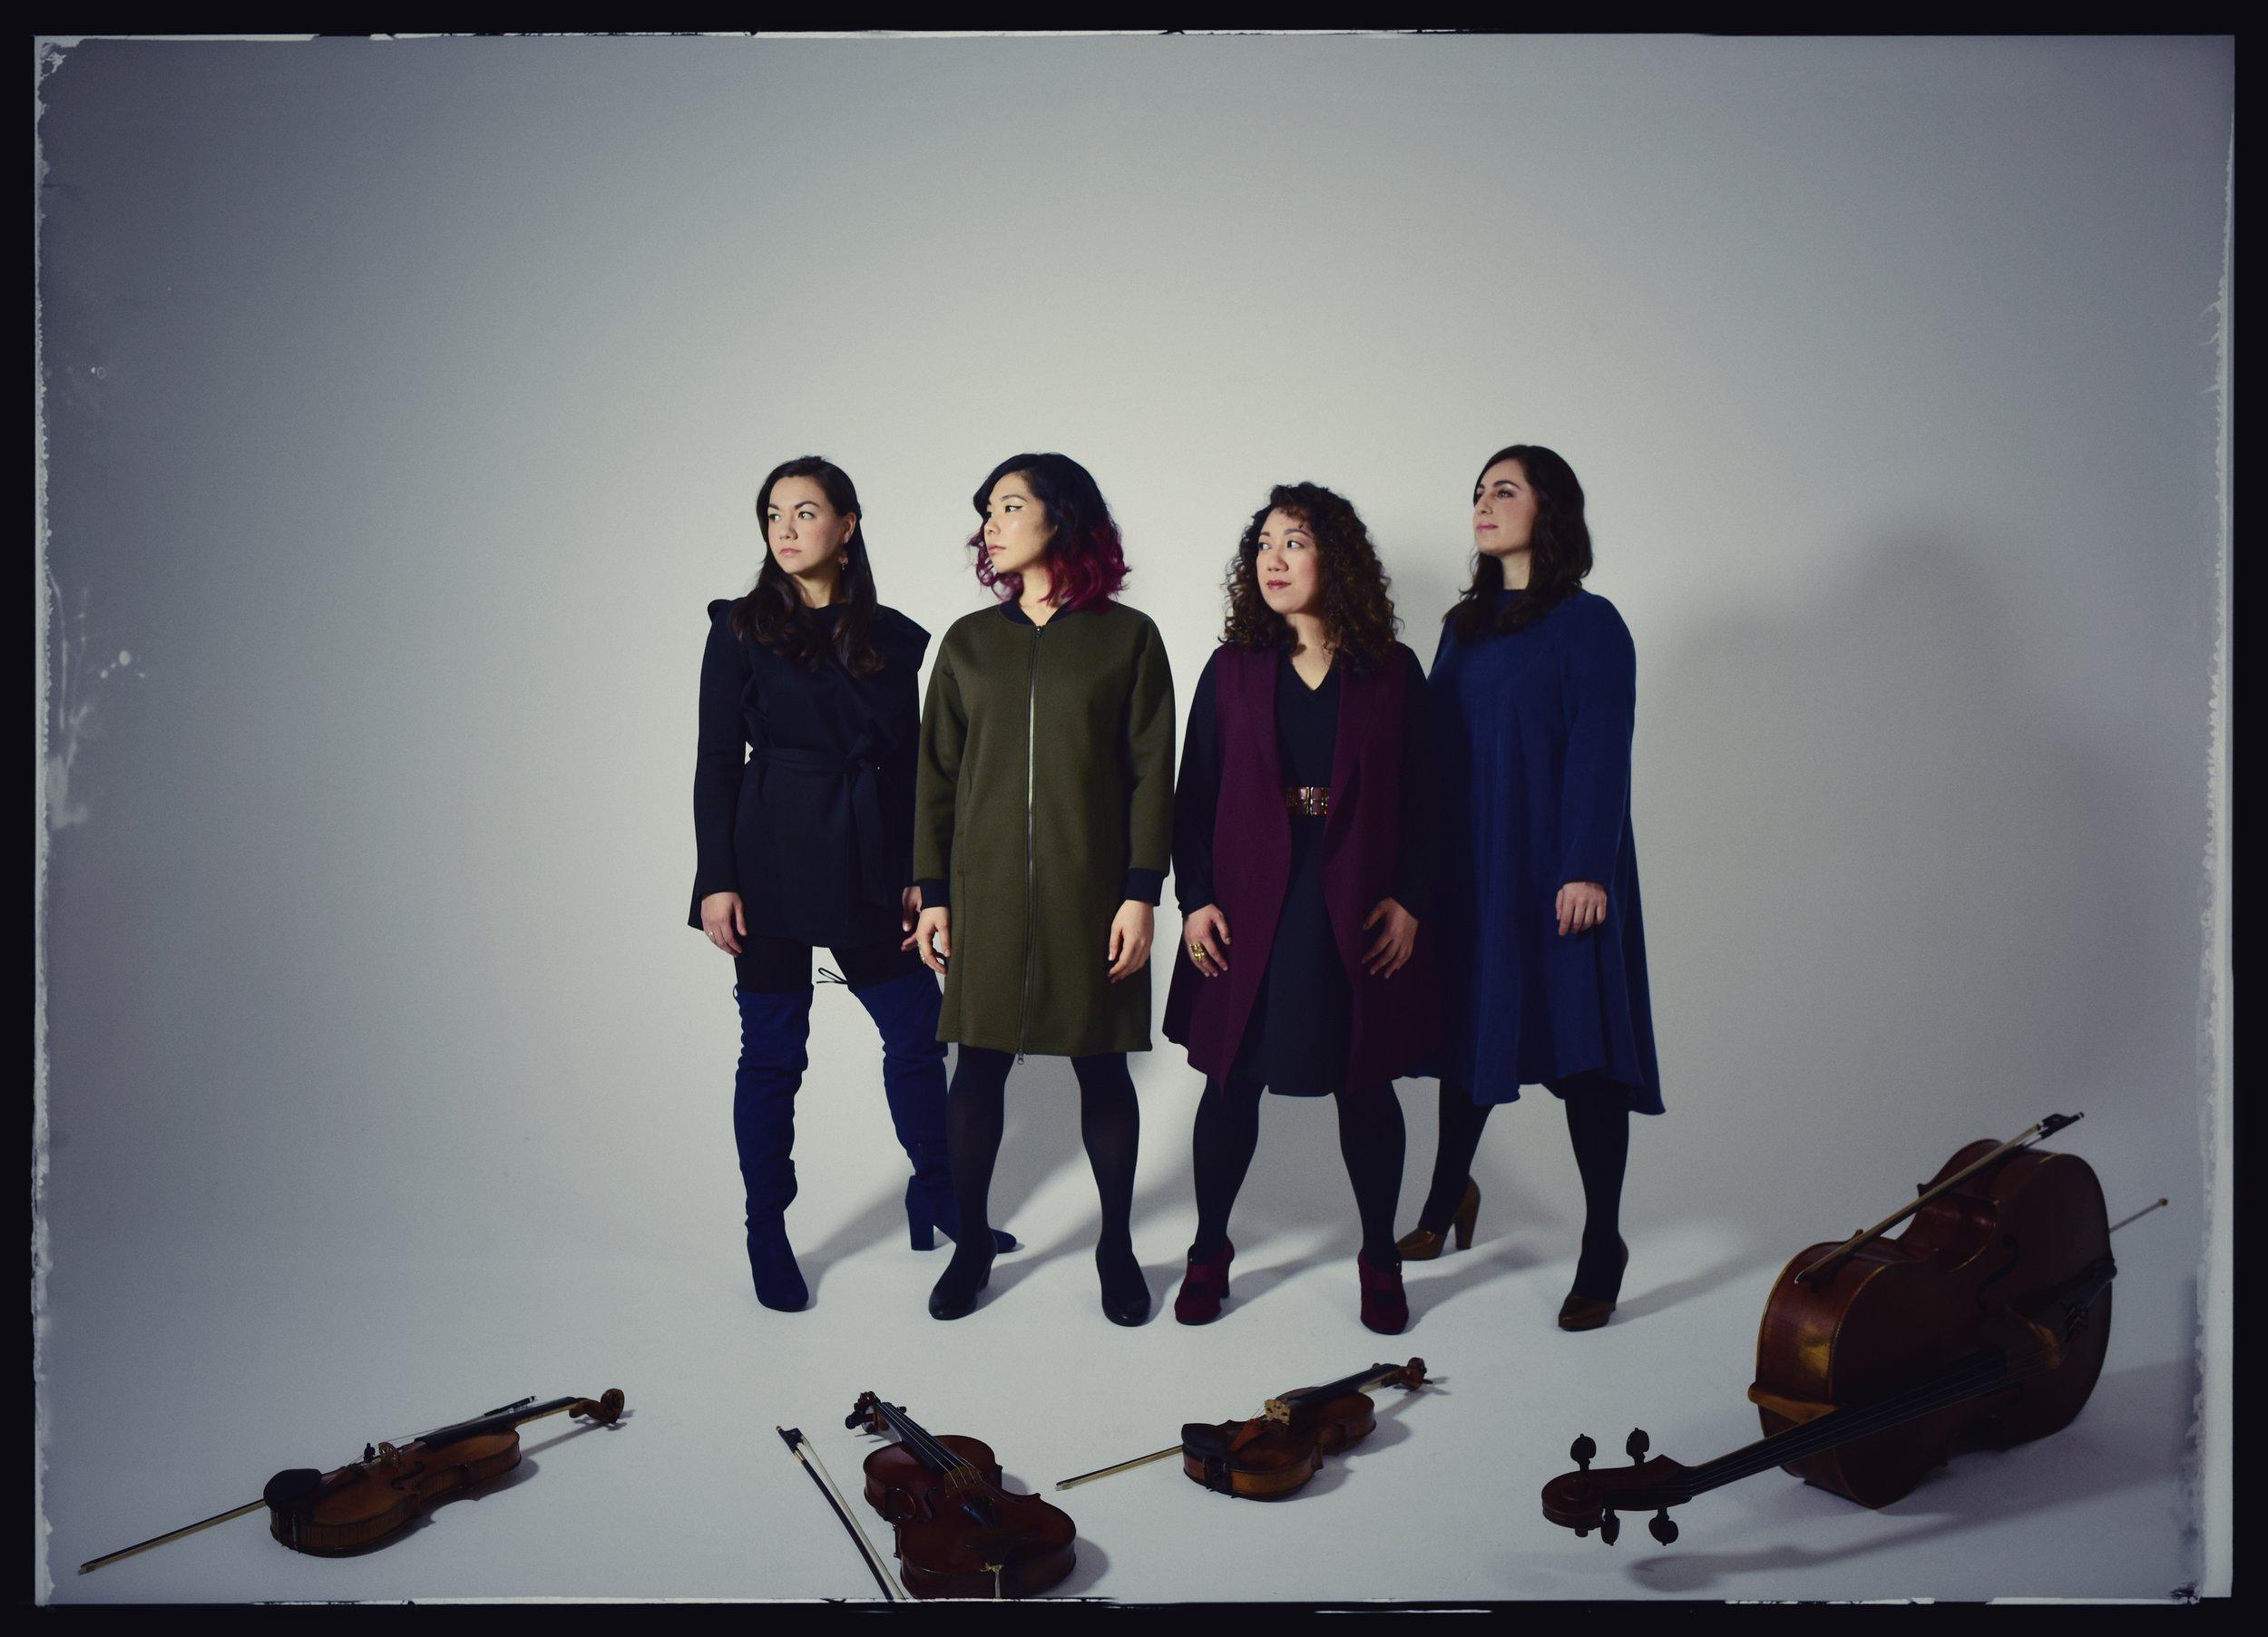 Aizuri Quartet L-R: Ariana Kim (violin); Ayane Kozasa (viola); Miho Saegusa (violin); Karen Ouzounian (cello) Photo credit: Shervin Lainez